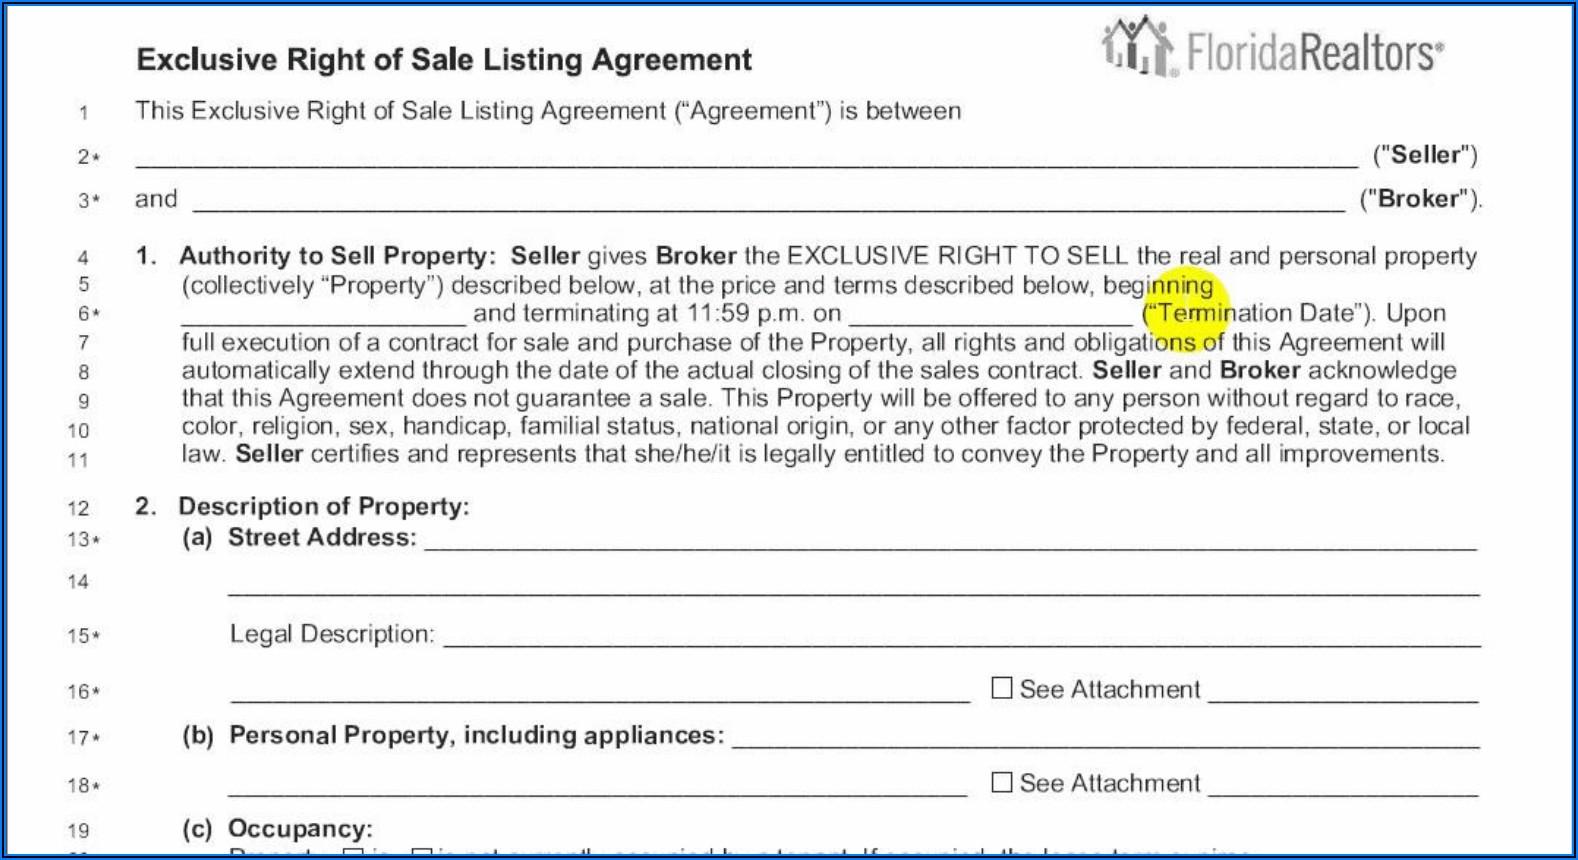 Colorado Real Estate Referral Fee Agreement